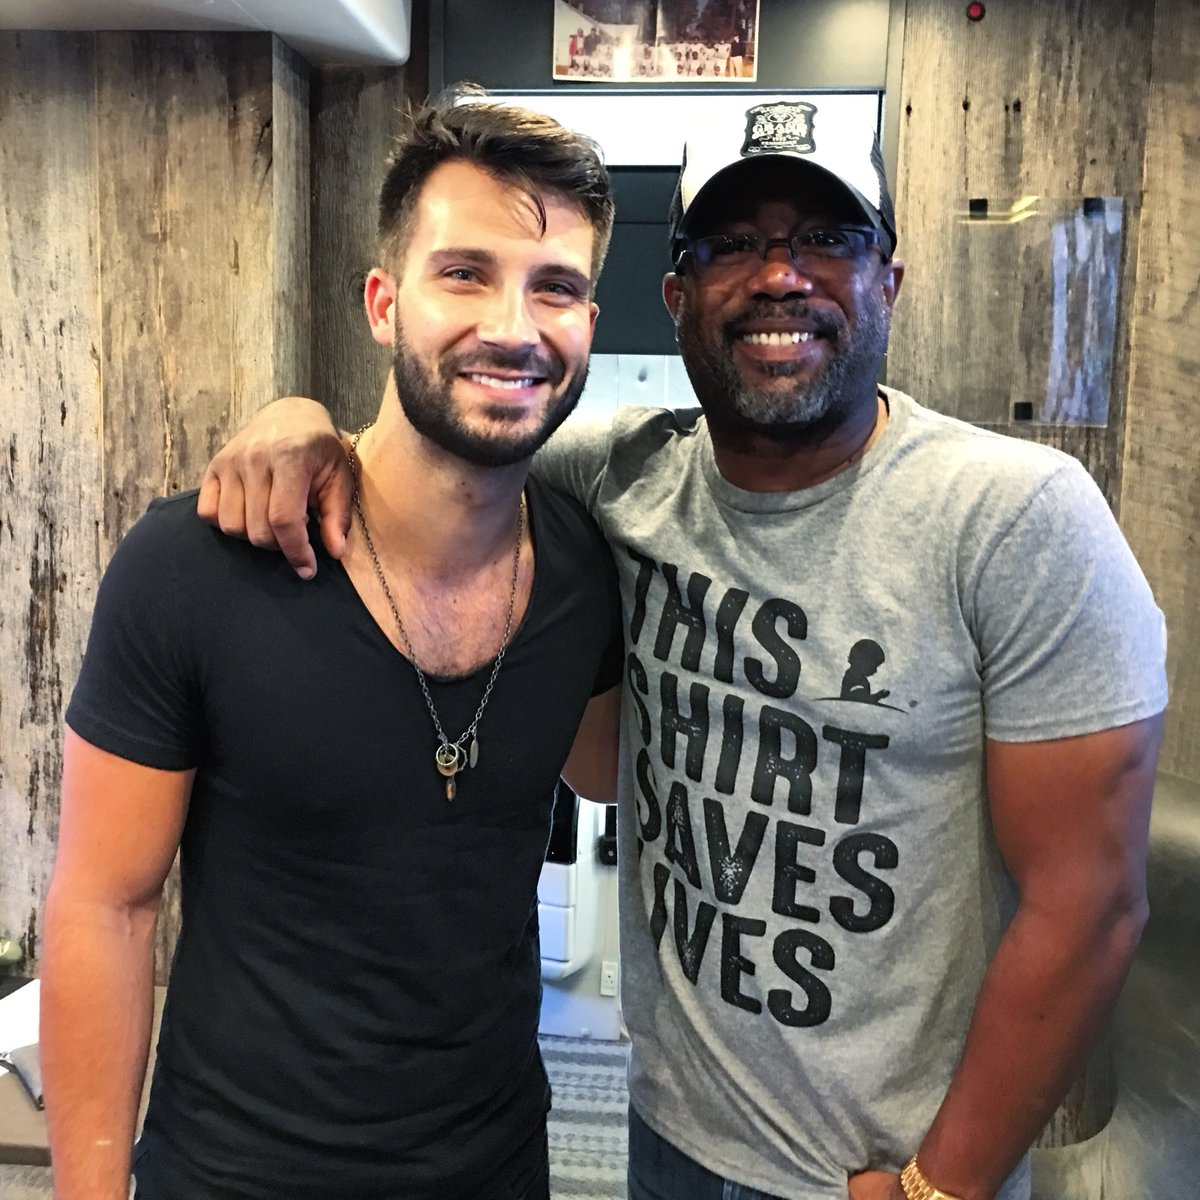 Get his new album #WhenWasTheLastTime now! It's soo good.  @dariusrucker #newmusic #MitchellLee #TheVoice  #DariusRucker #Hootie #Charleston #SouthCarolina #artists<br>http://pic.twitter.com/rHktrmetOL